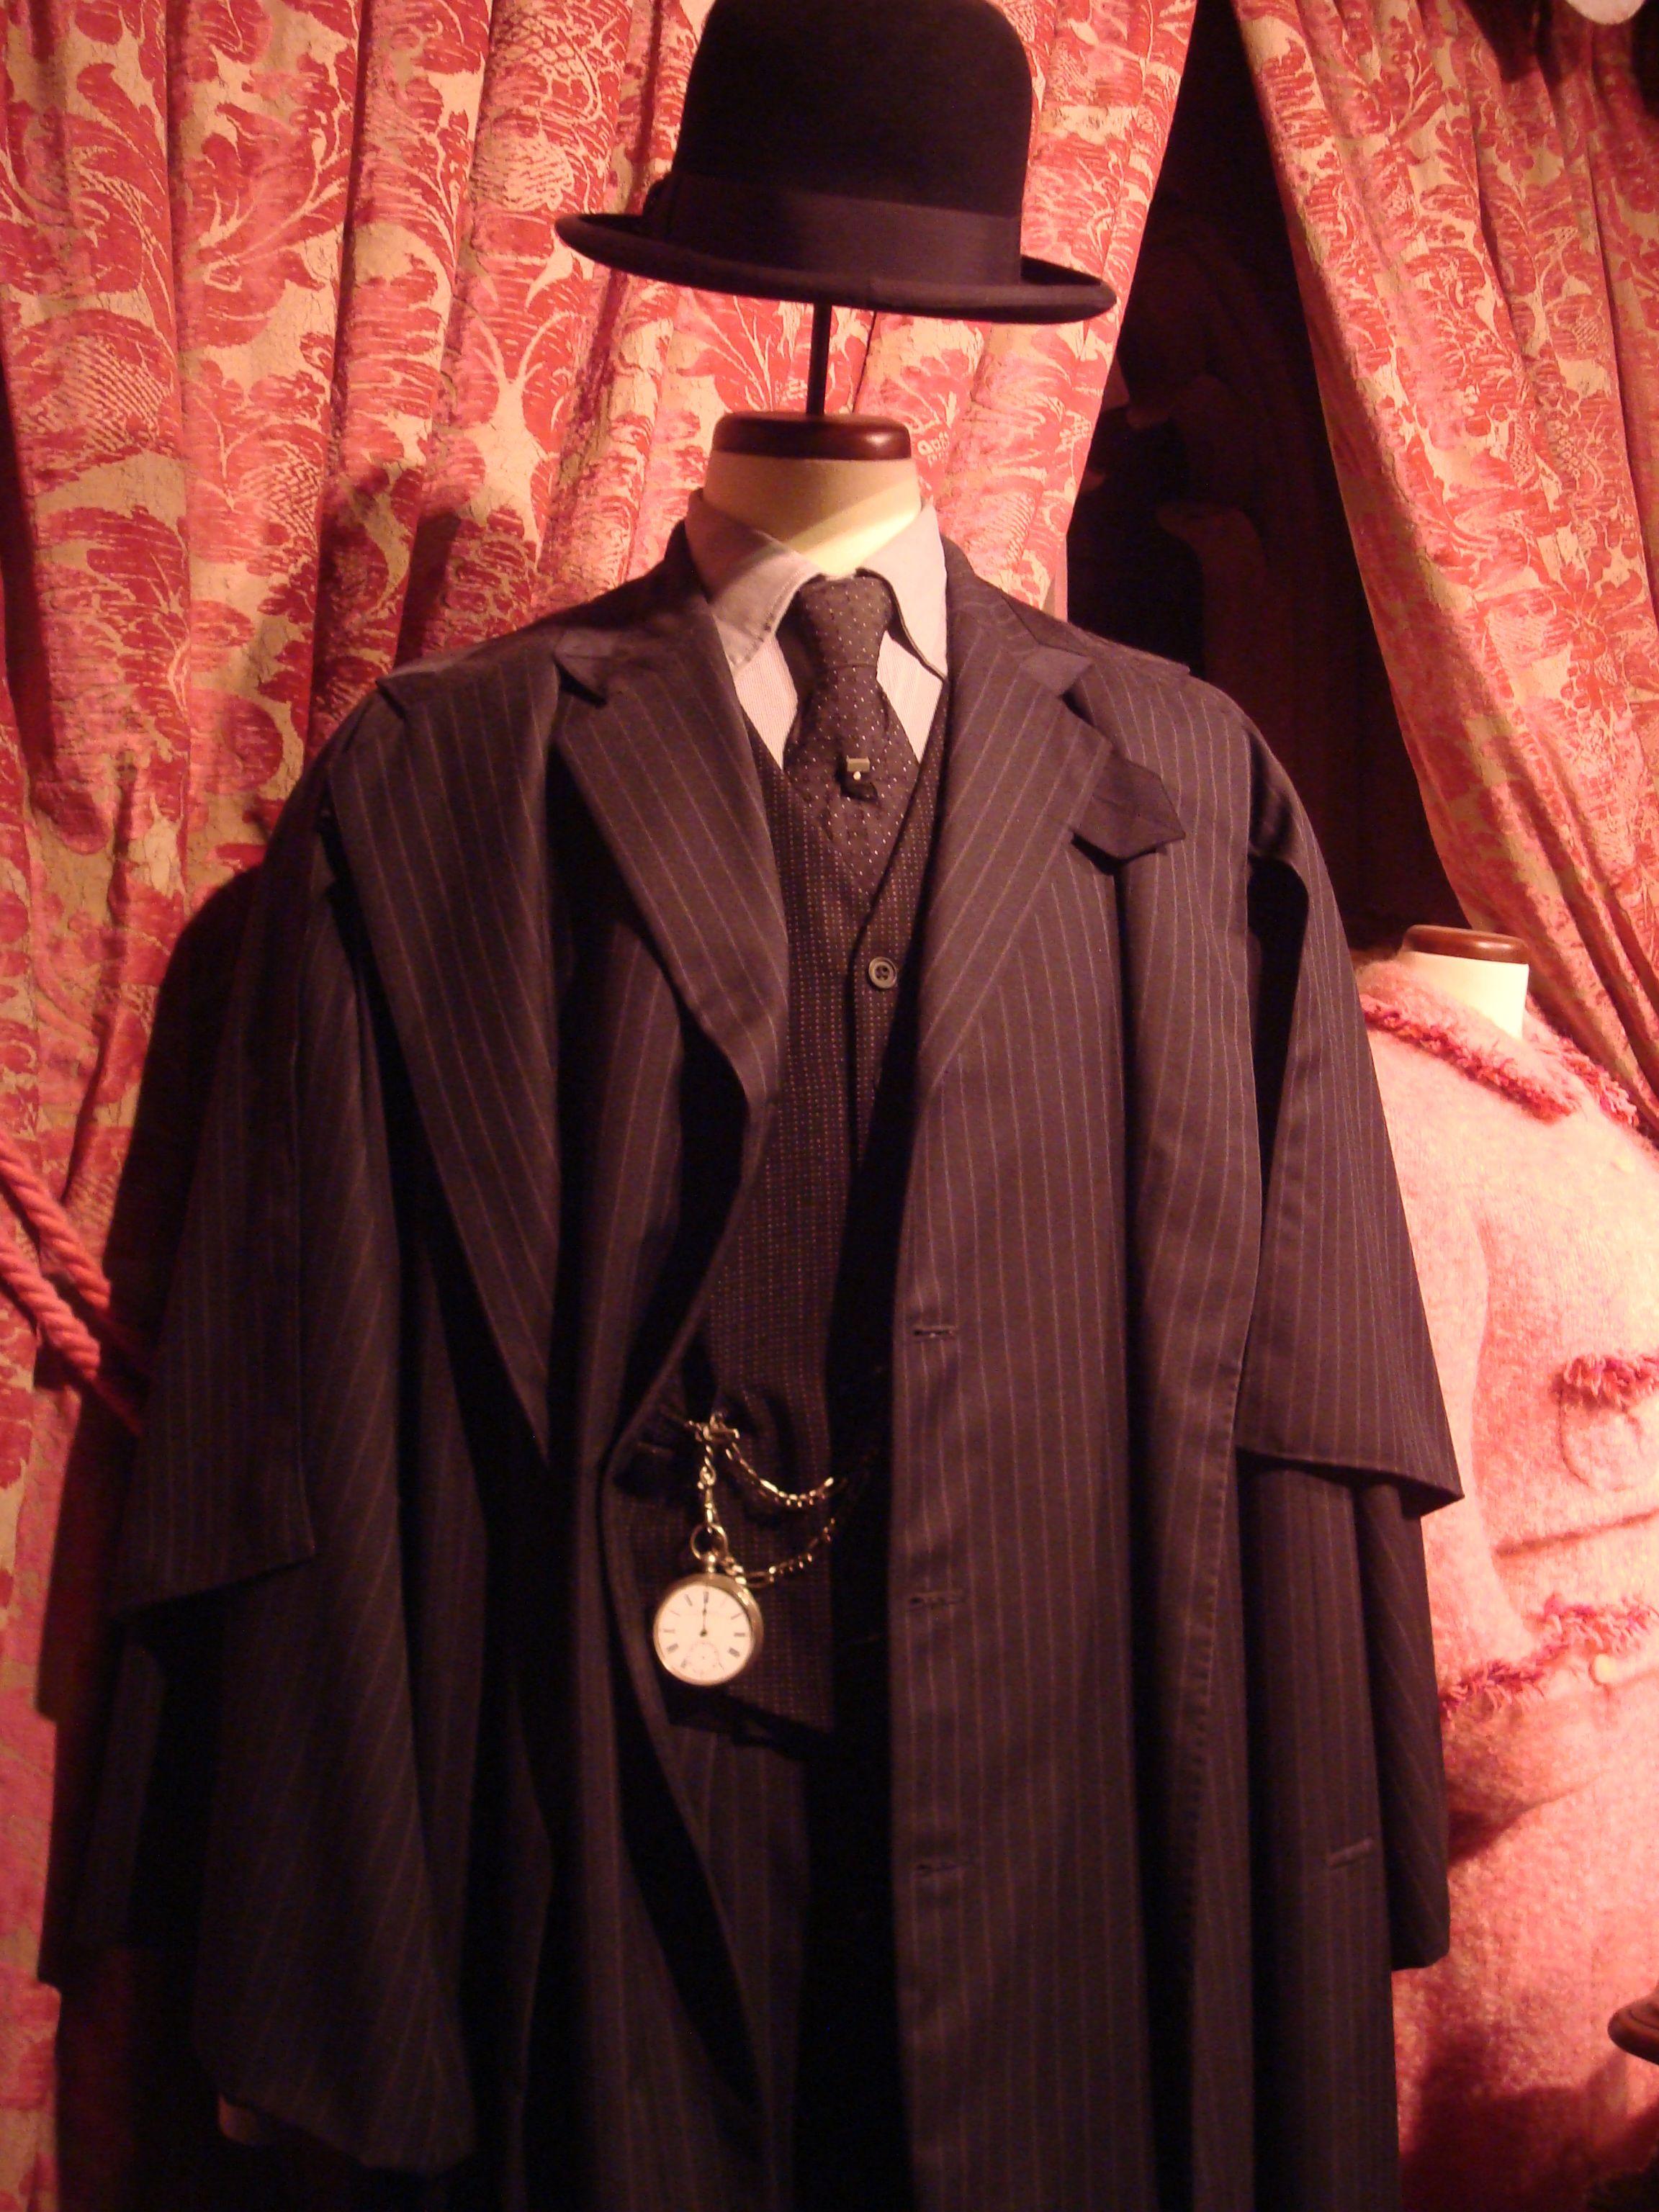 Cornelius Fudge Harry Potter Outfits Harry Potter Costume Harry Potter